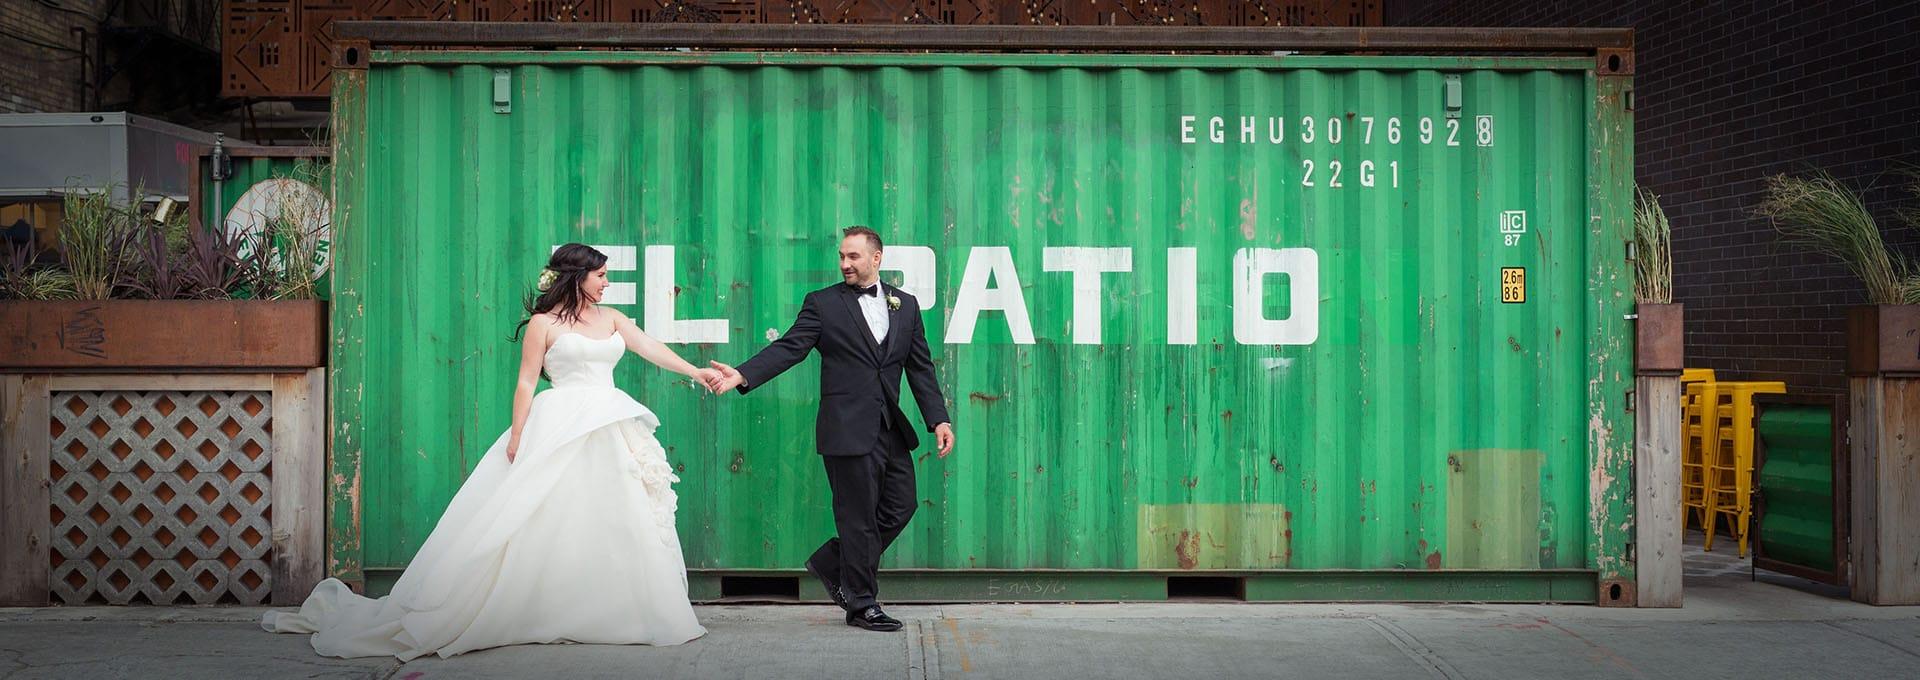 Wedding Photography Services | Toronto Wedding Studios | Toronto Wedding | Toronto Photographer